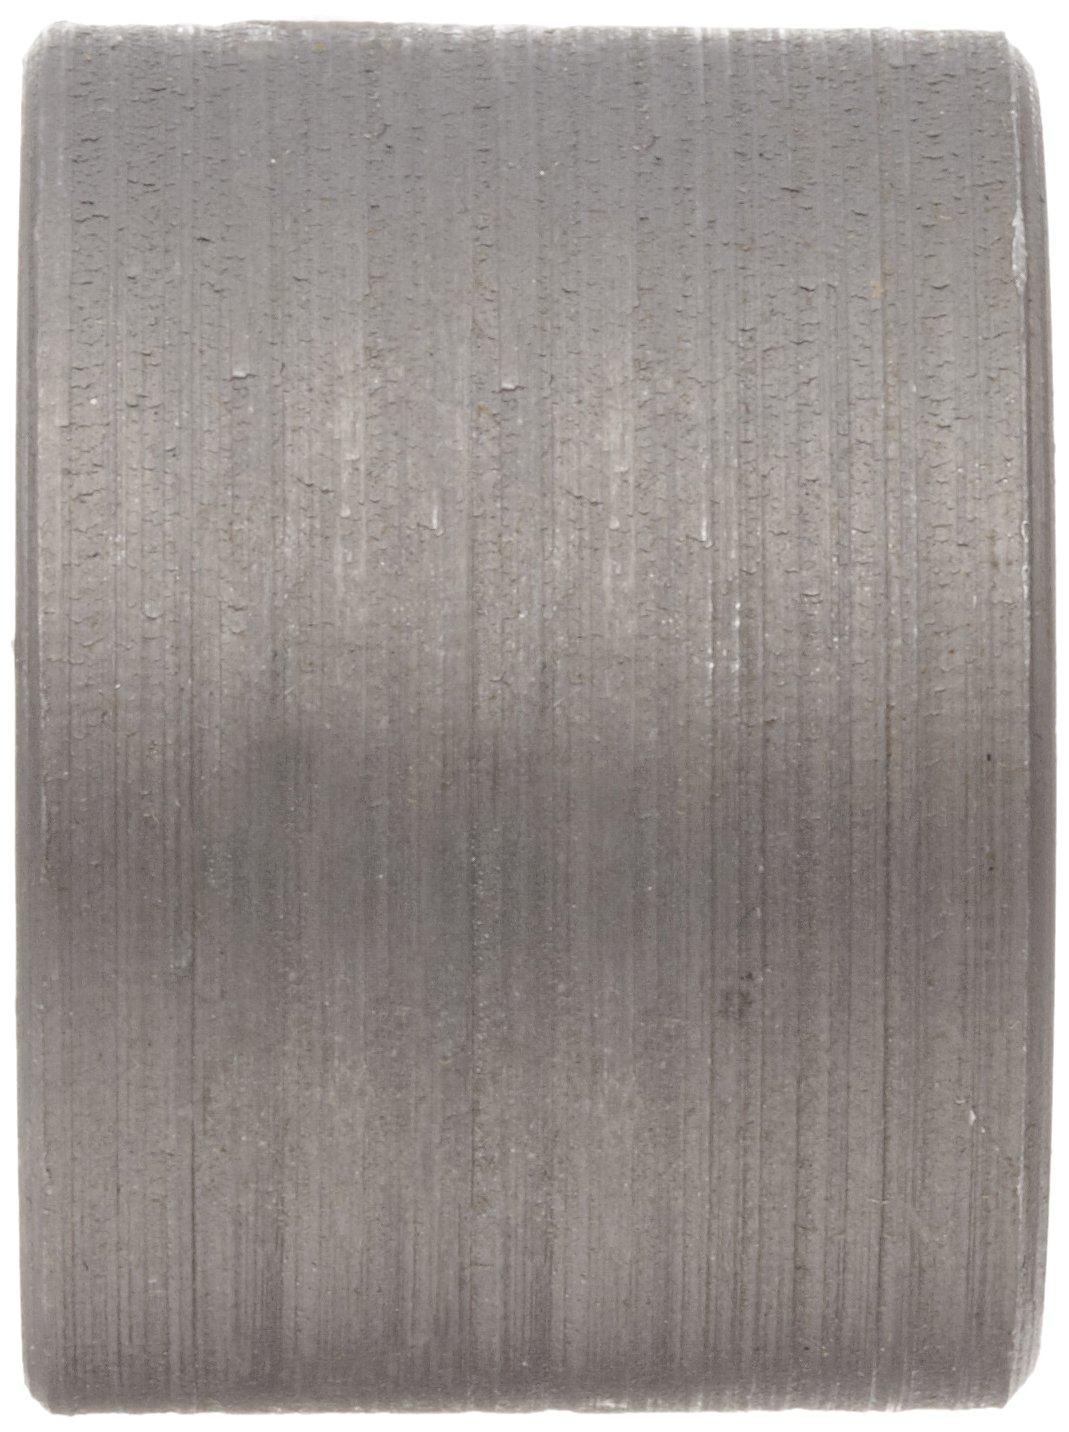 Anvil 2157 Forged Steel Pipe Fitting Class 3000 3//4 Female Anvil International 0362085201 Socket Weld Cap